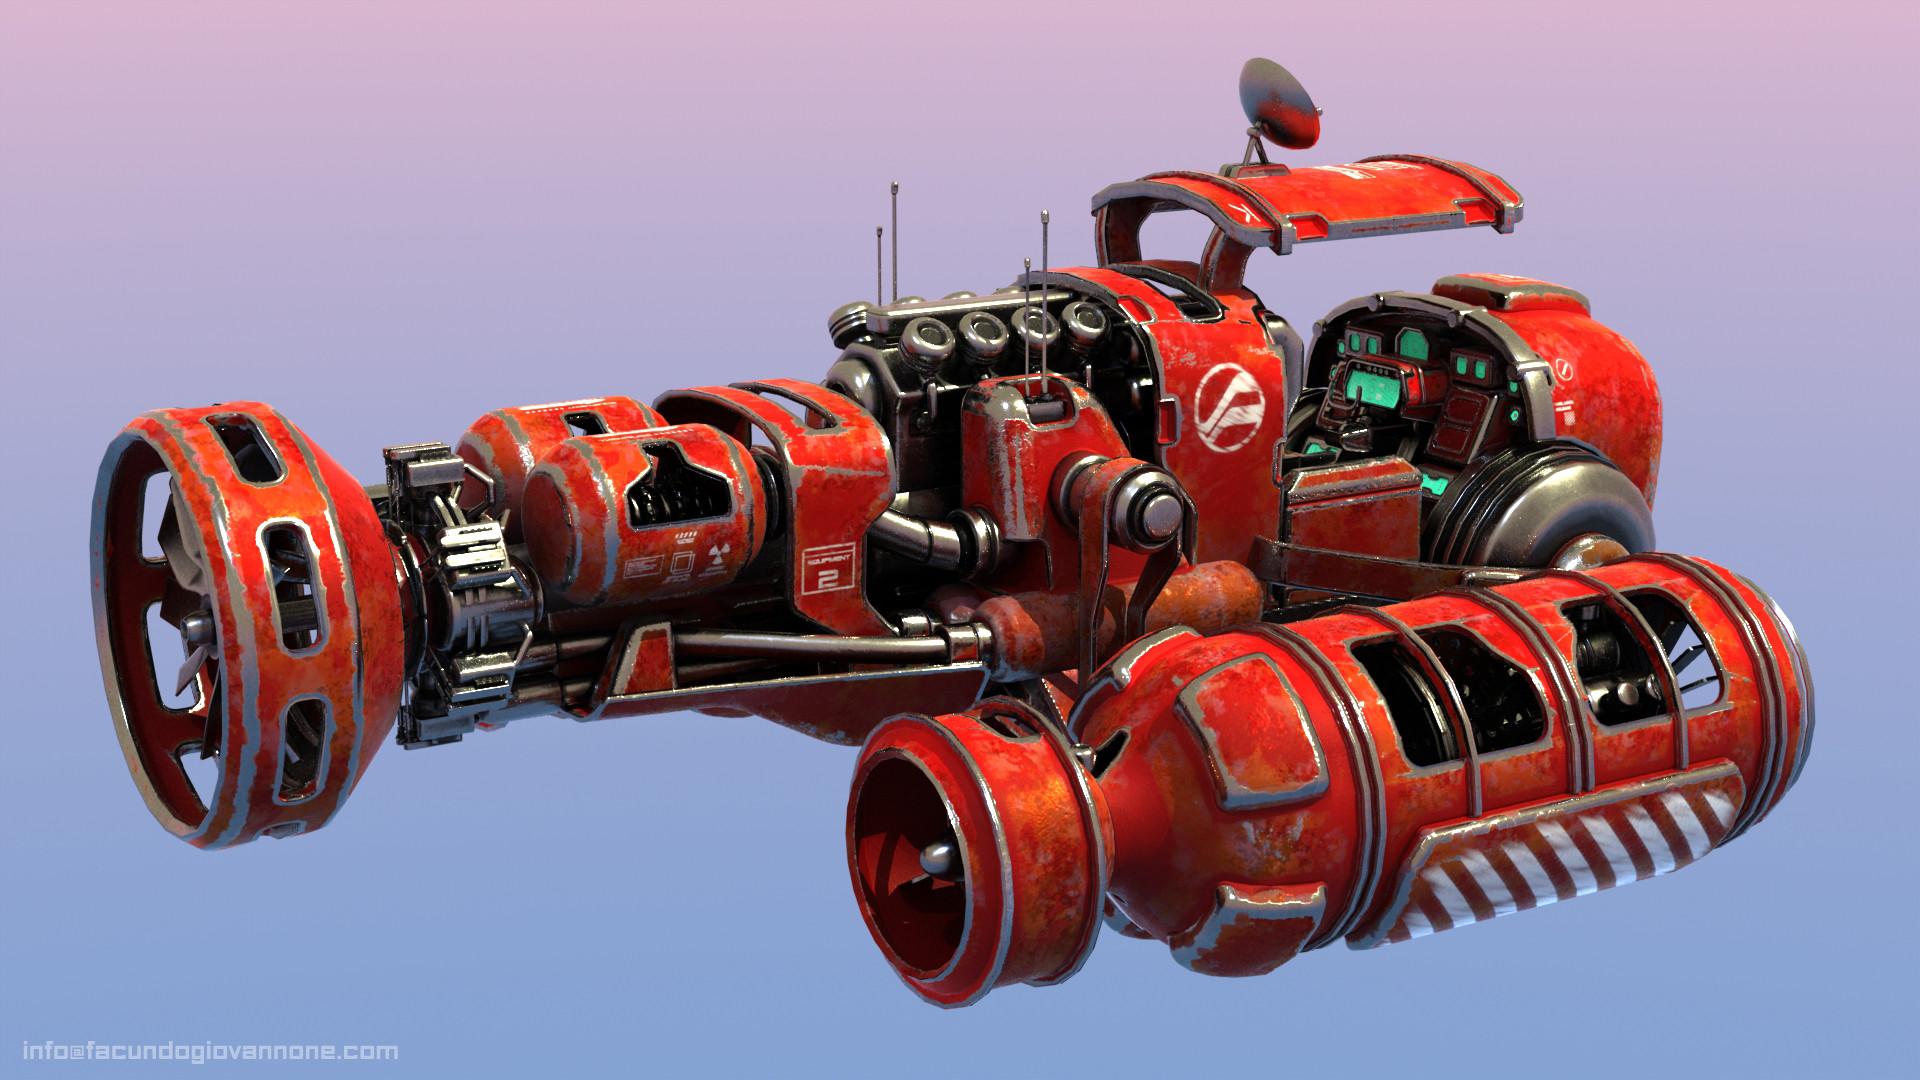 Facundo giovannone submarine 03